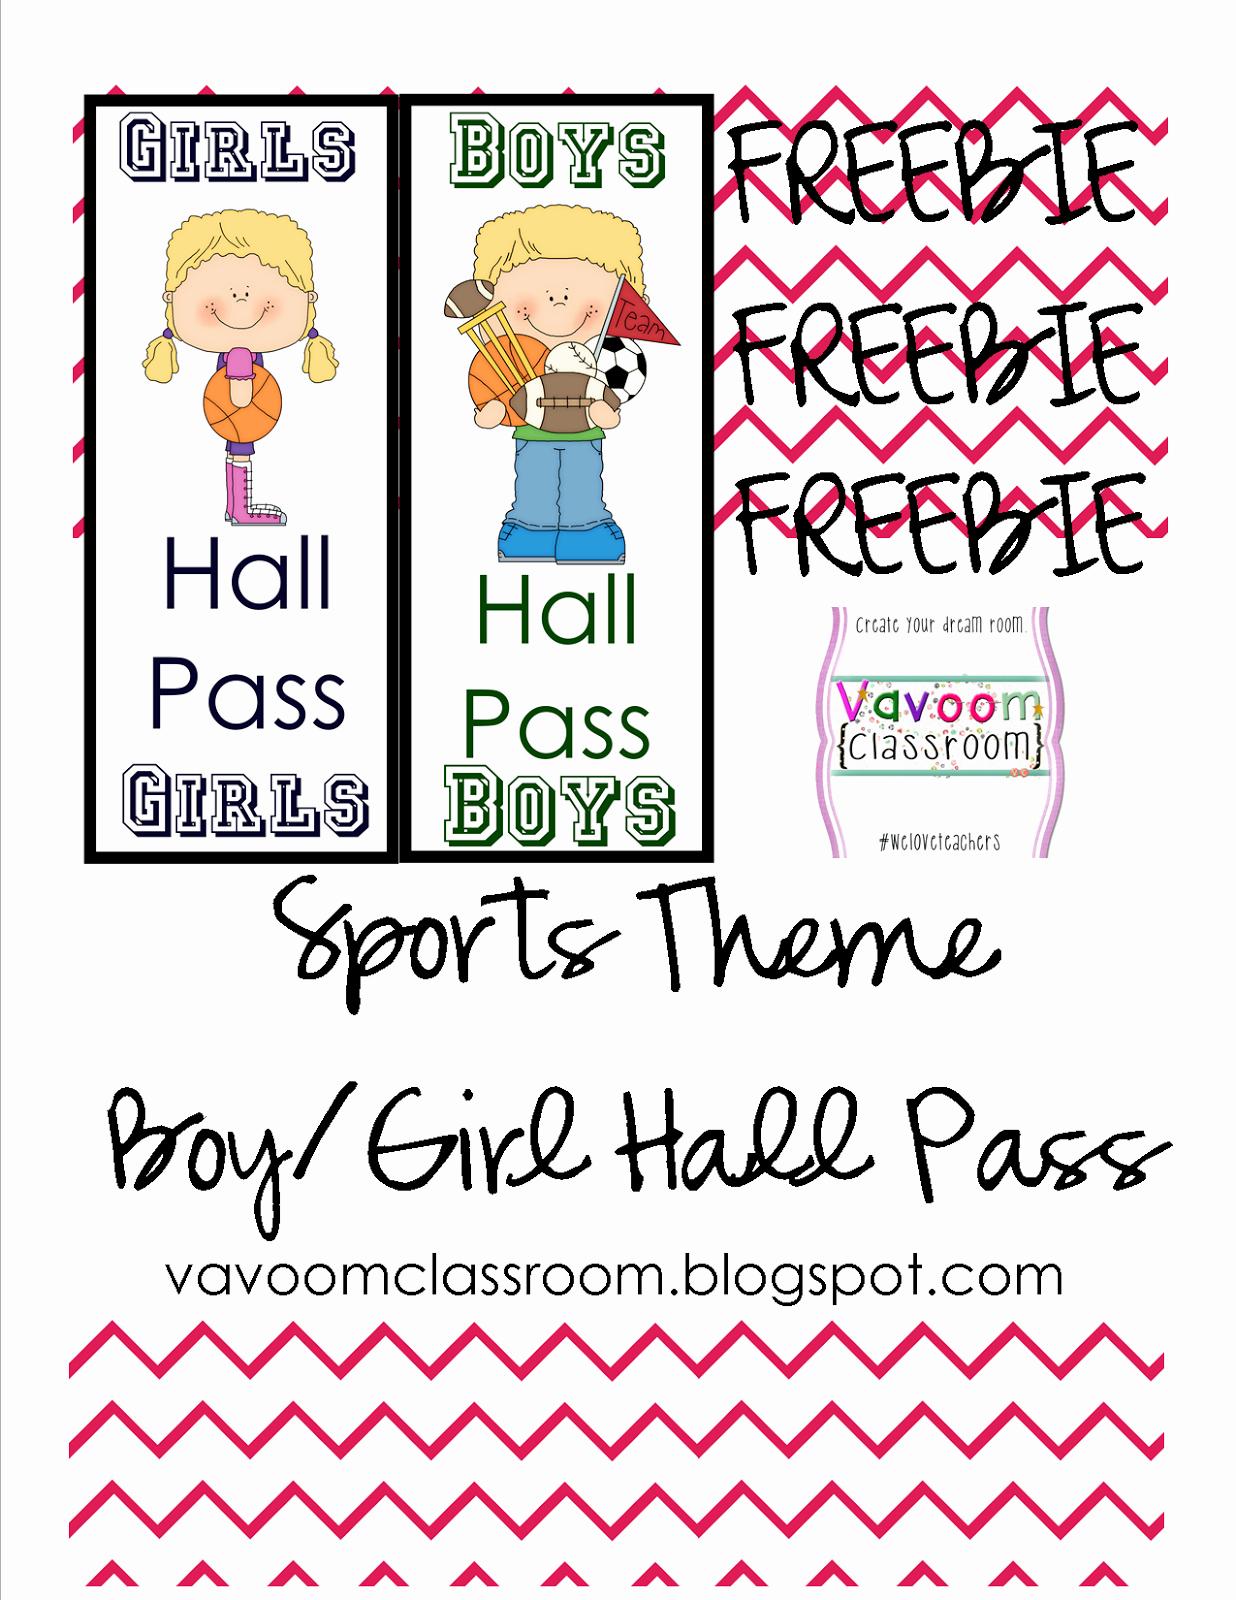 Printable Hall Passes for Students New Vavoom Classroom Sports theme Classroom Kit Hall Passes